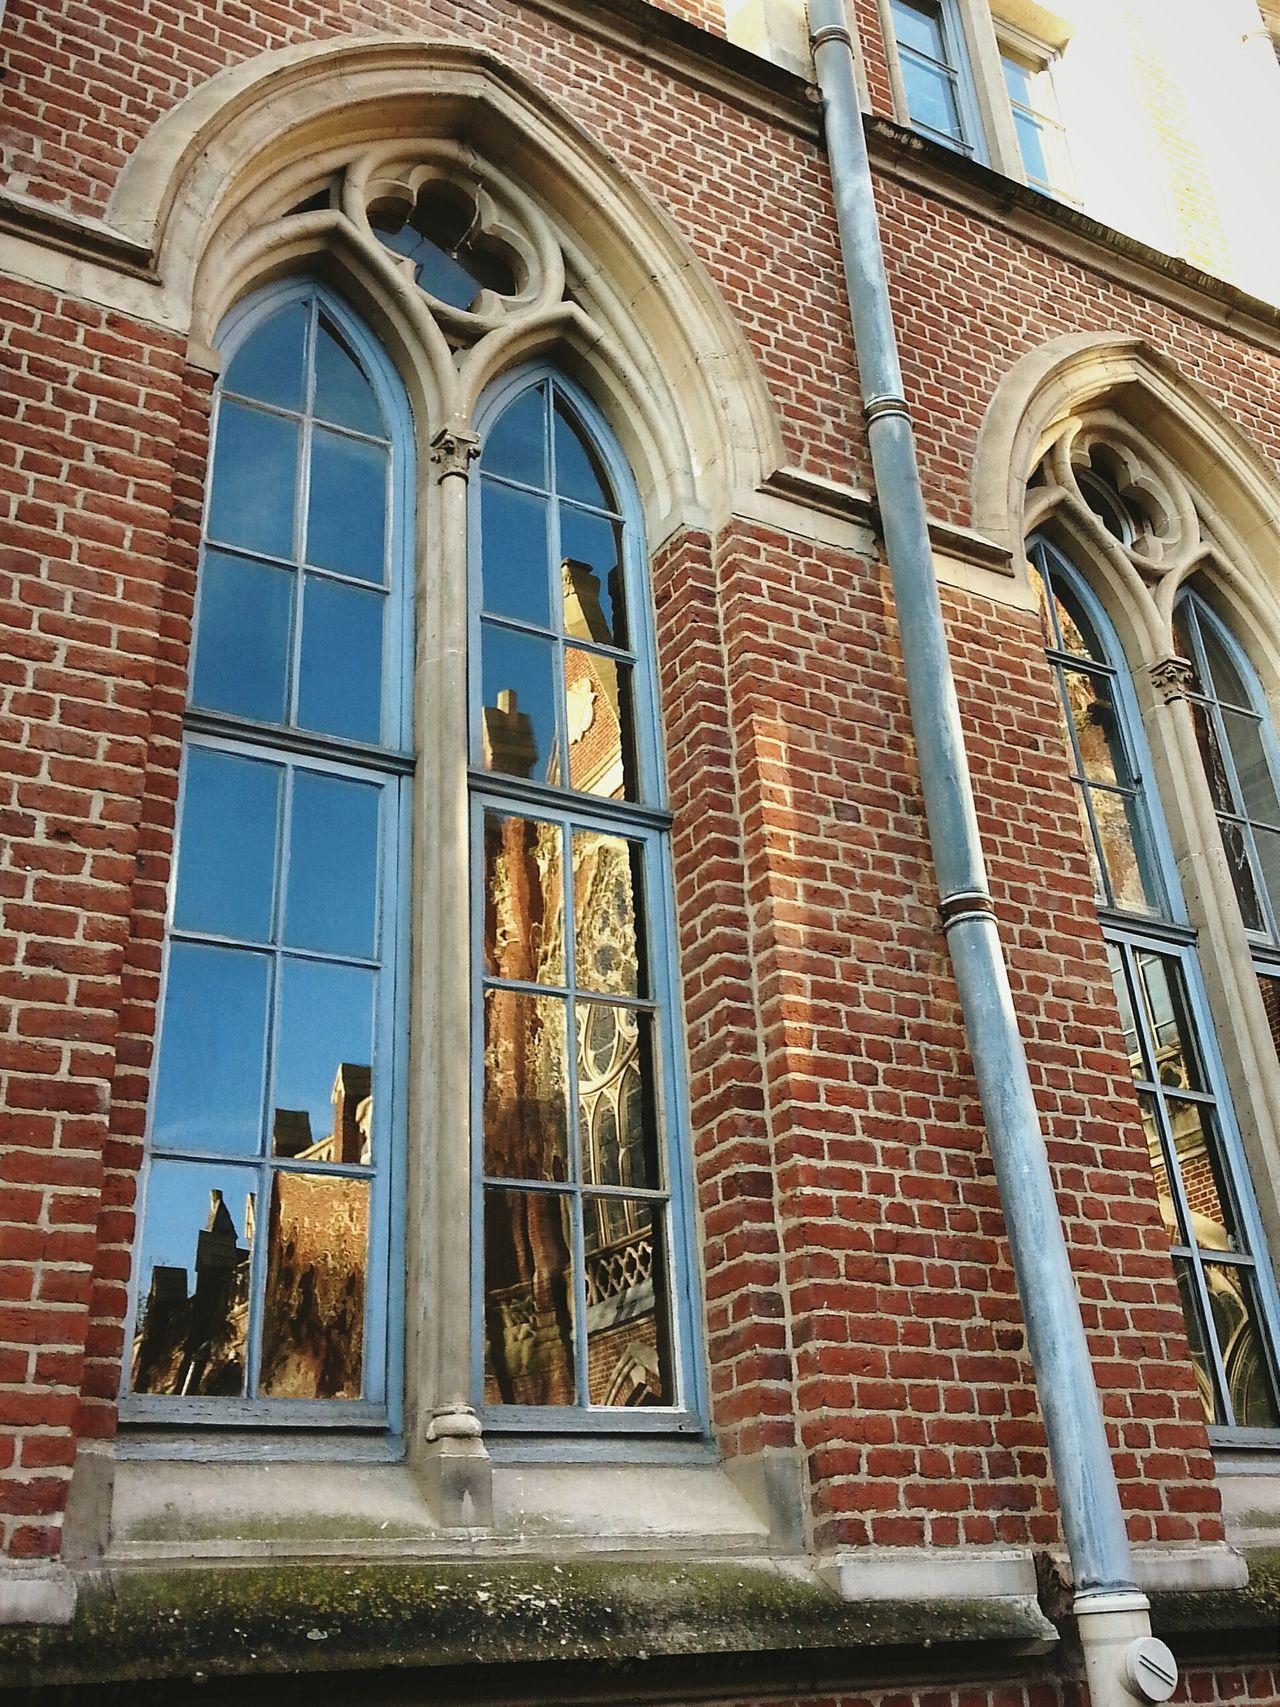 Lille Redbricks Church Reflection_collection Oldschool Oldtown University